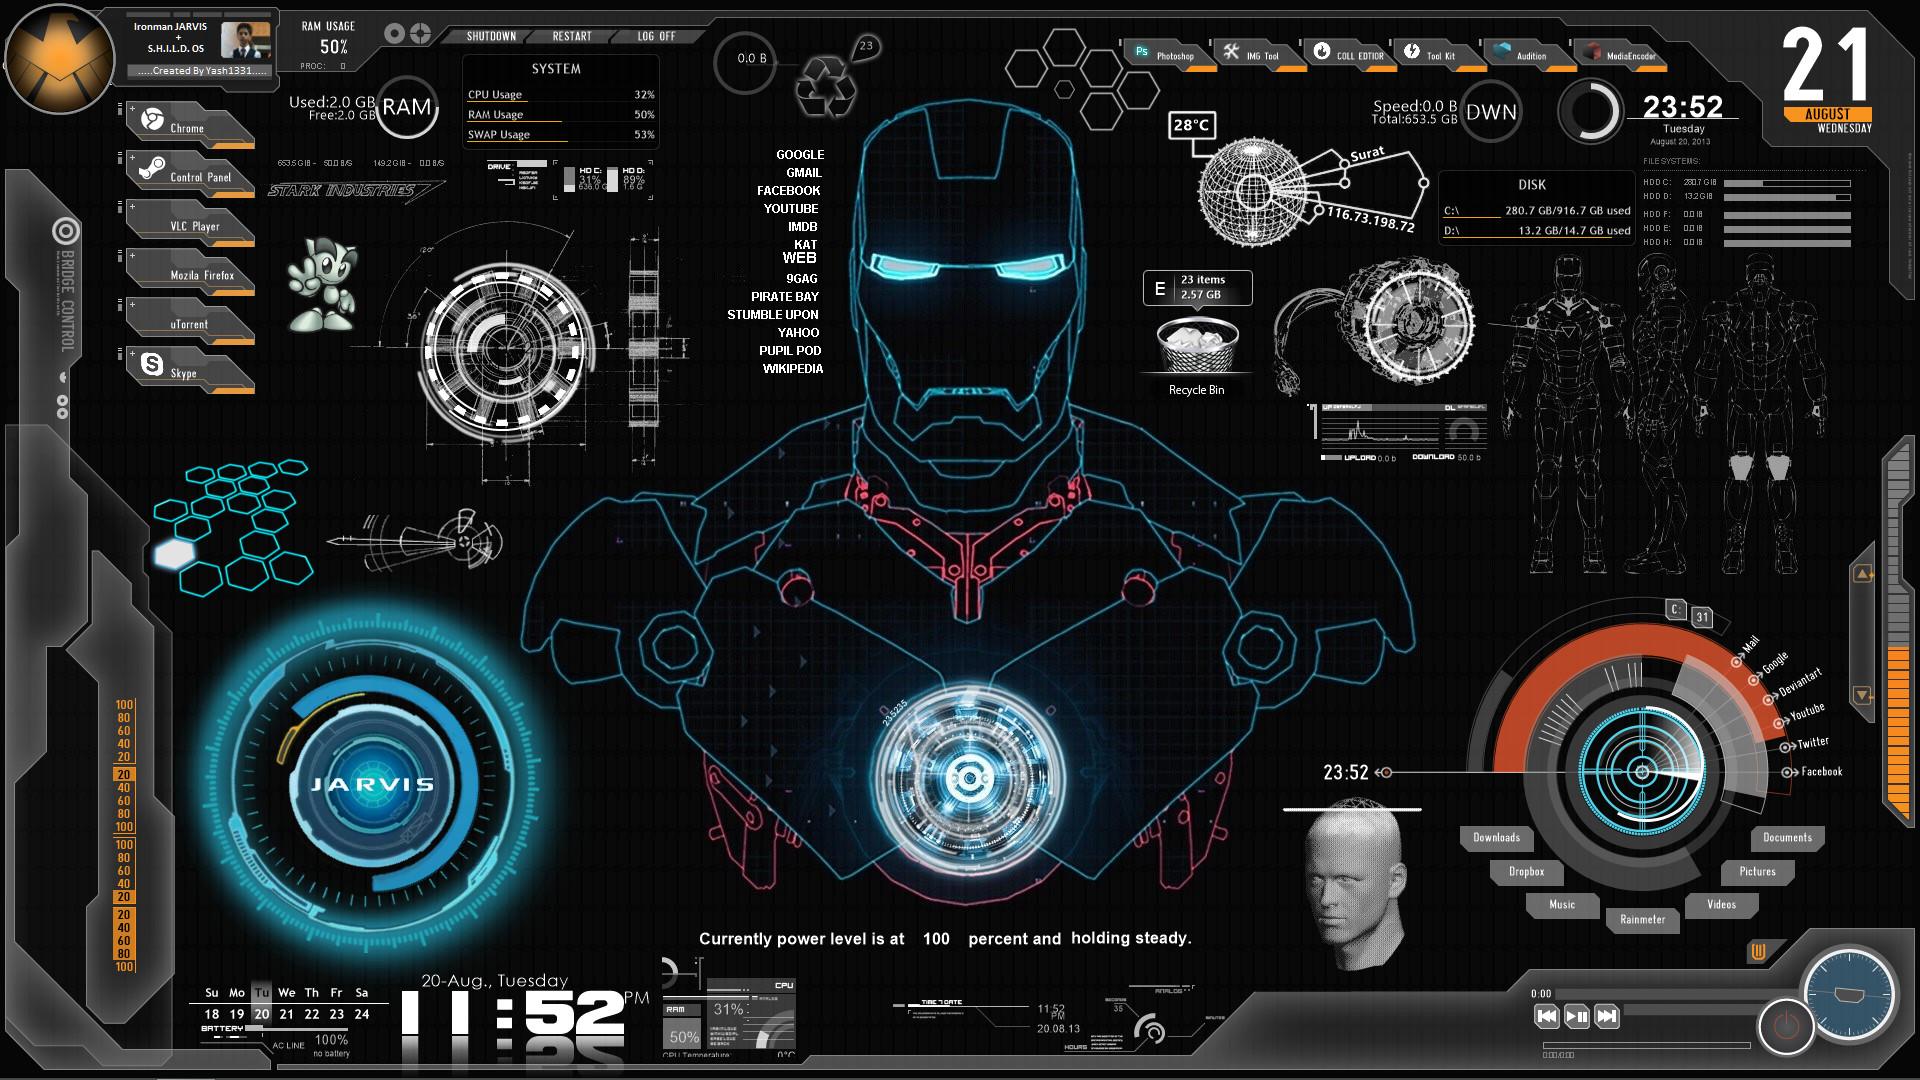 Iron Man Jarvis Wallpaper Ironman jarvis shield.